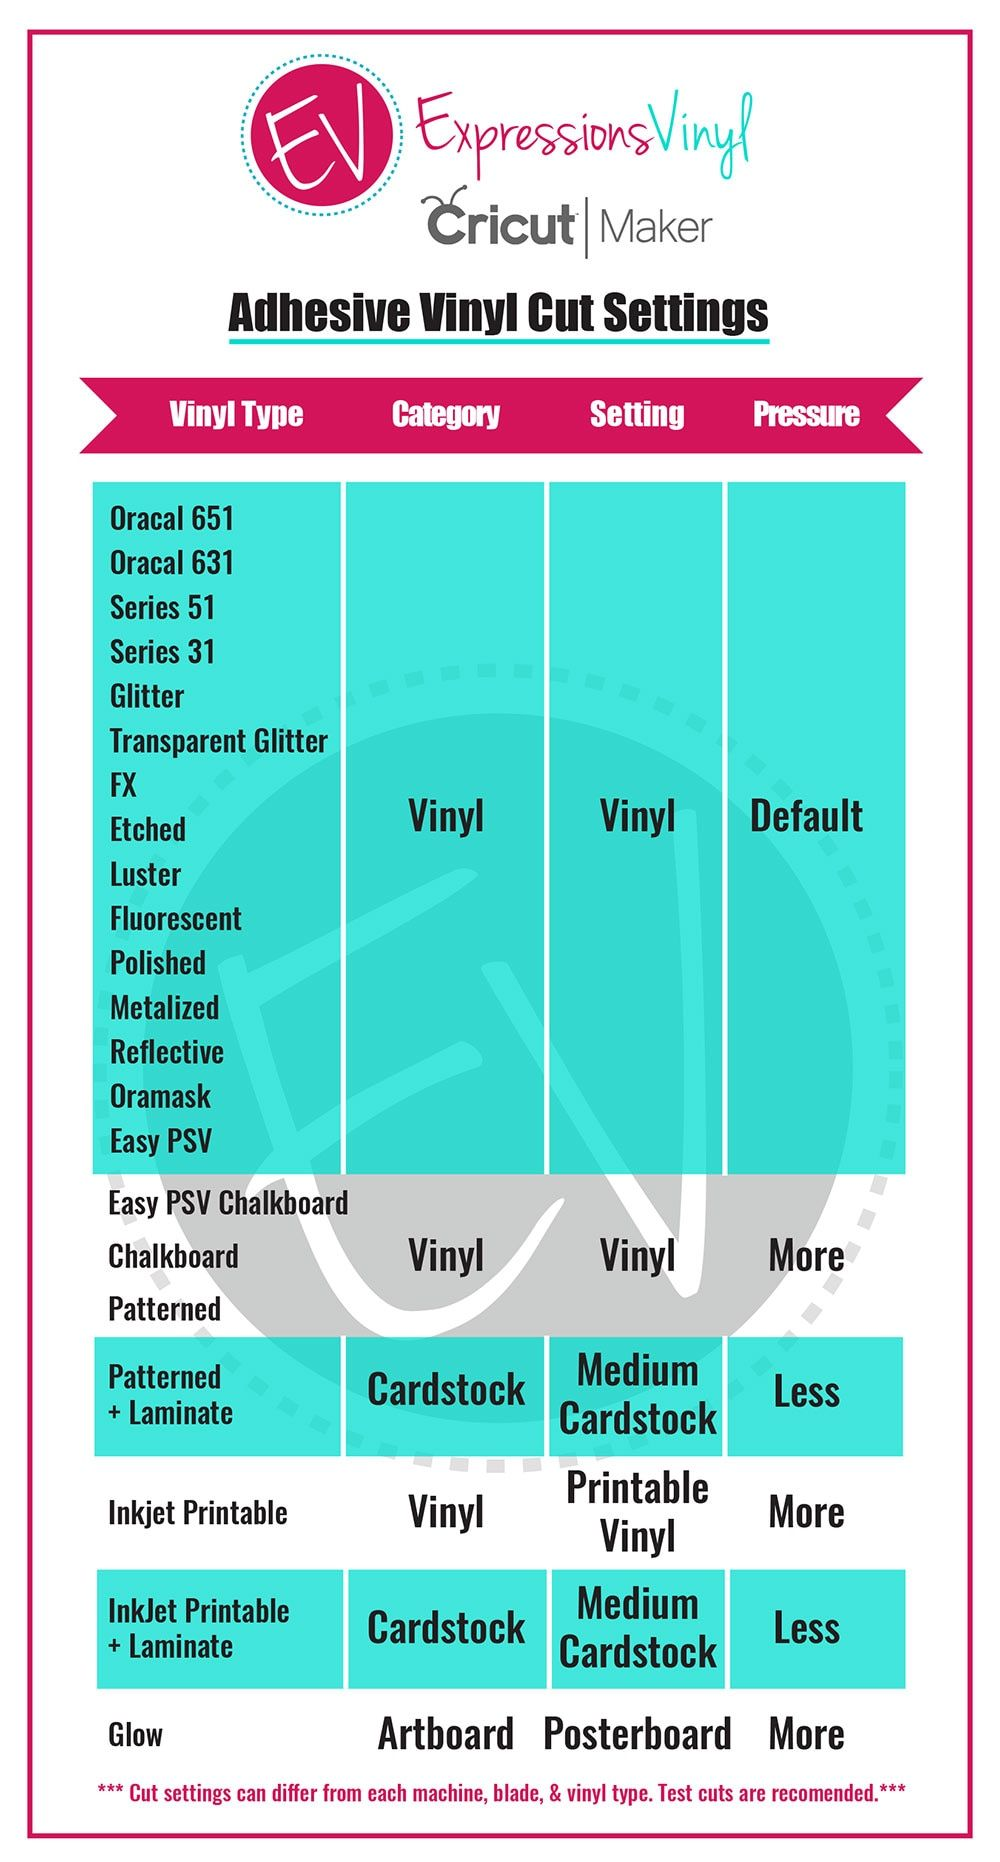 Machine Settings | cricut tips and tricks | Cricut, Vinyl